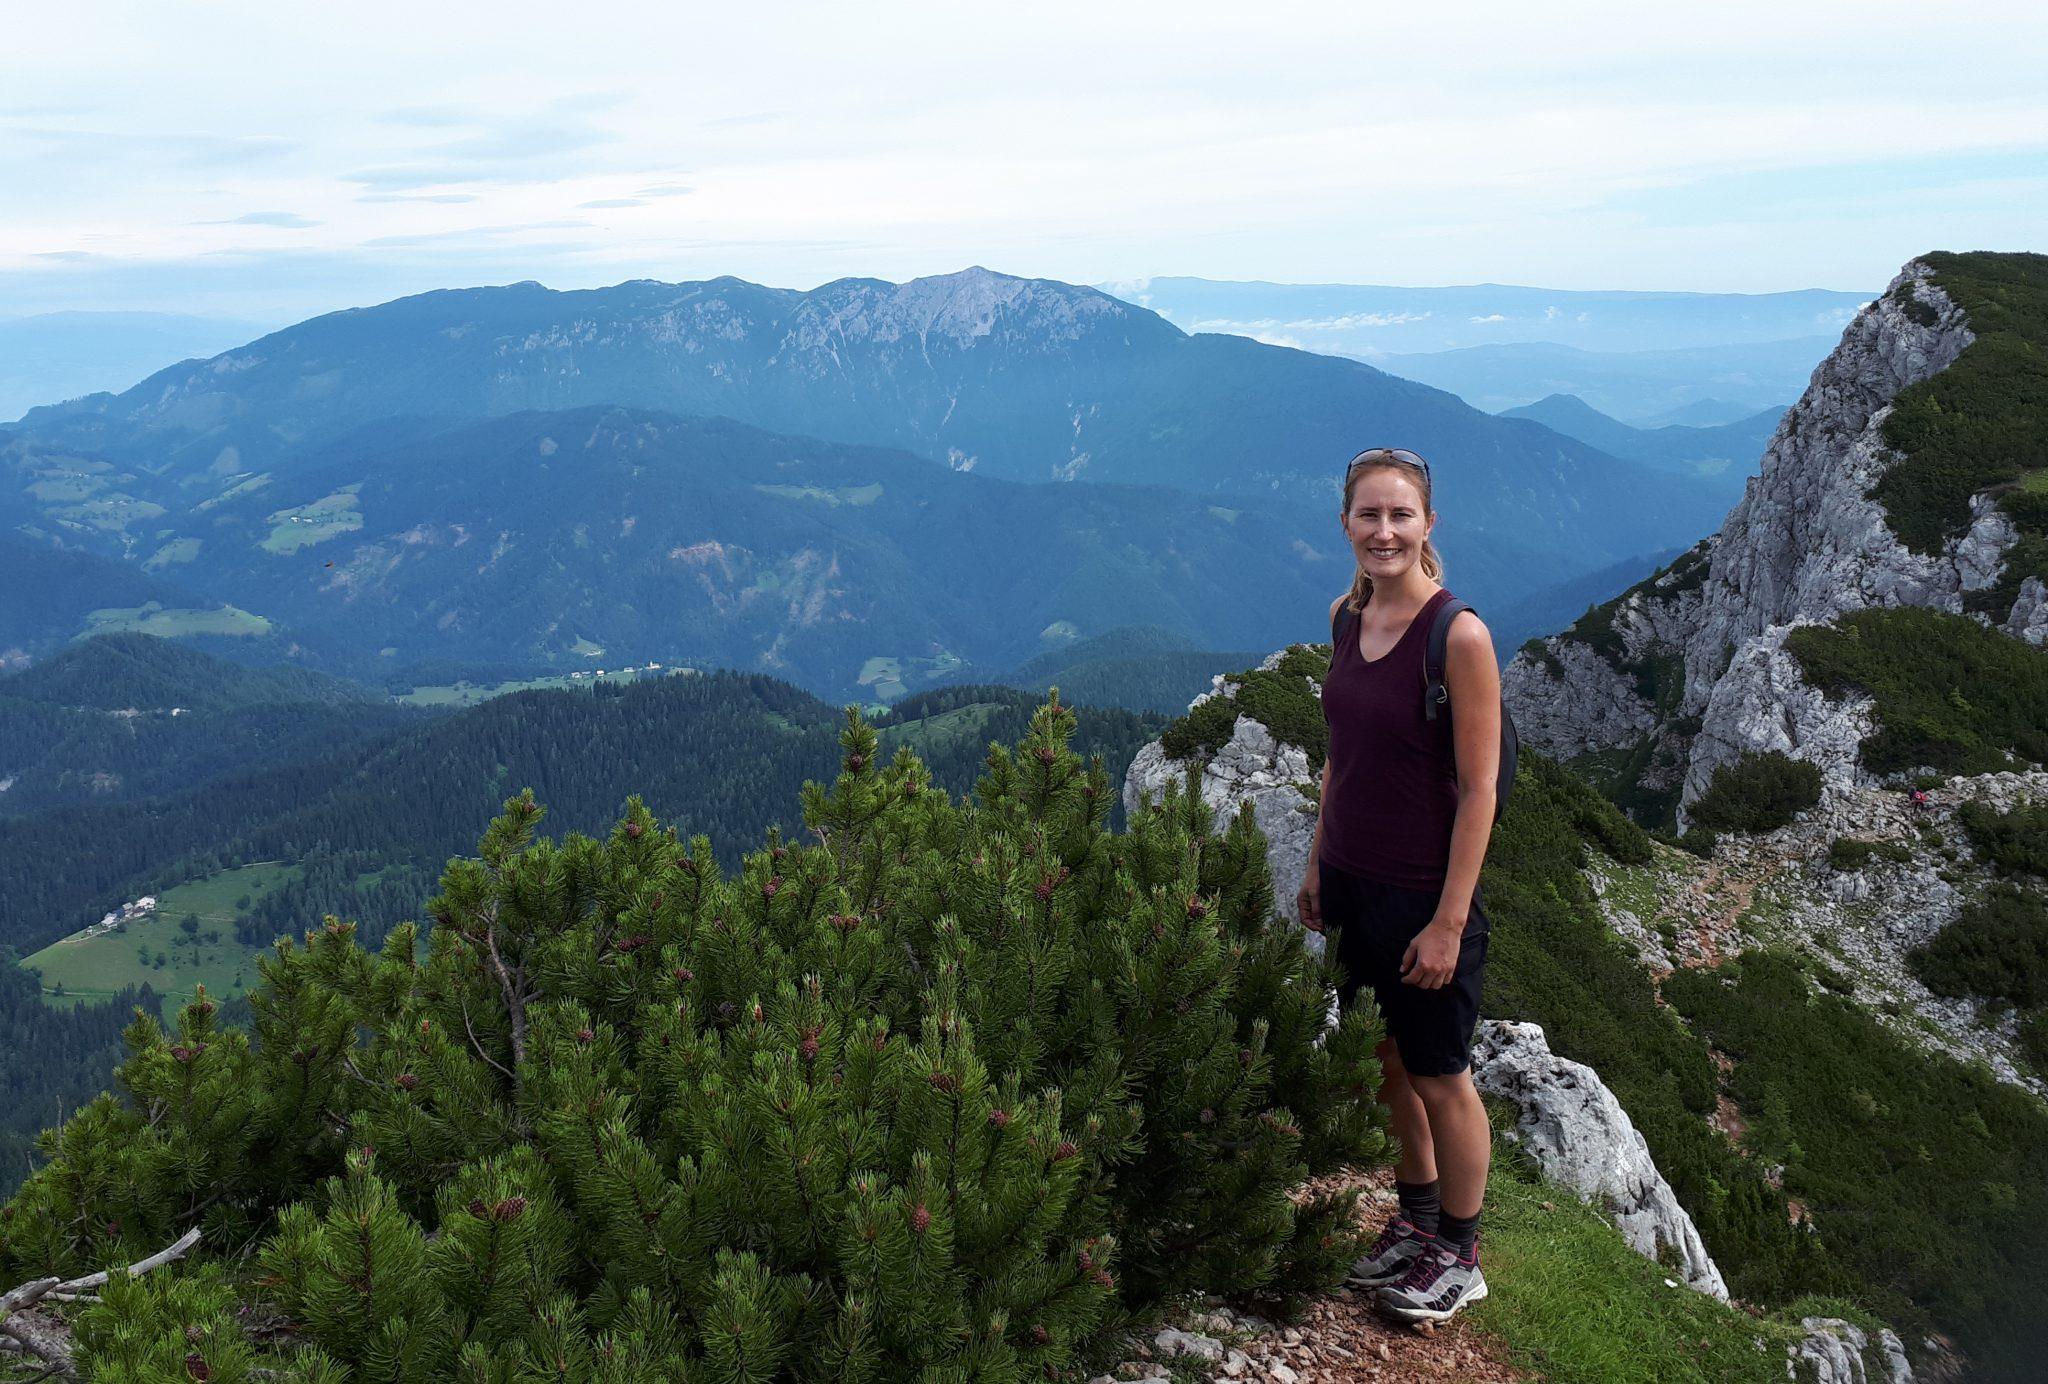 Project reseacher Anja Poberznik loves travelling.